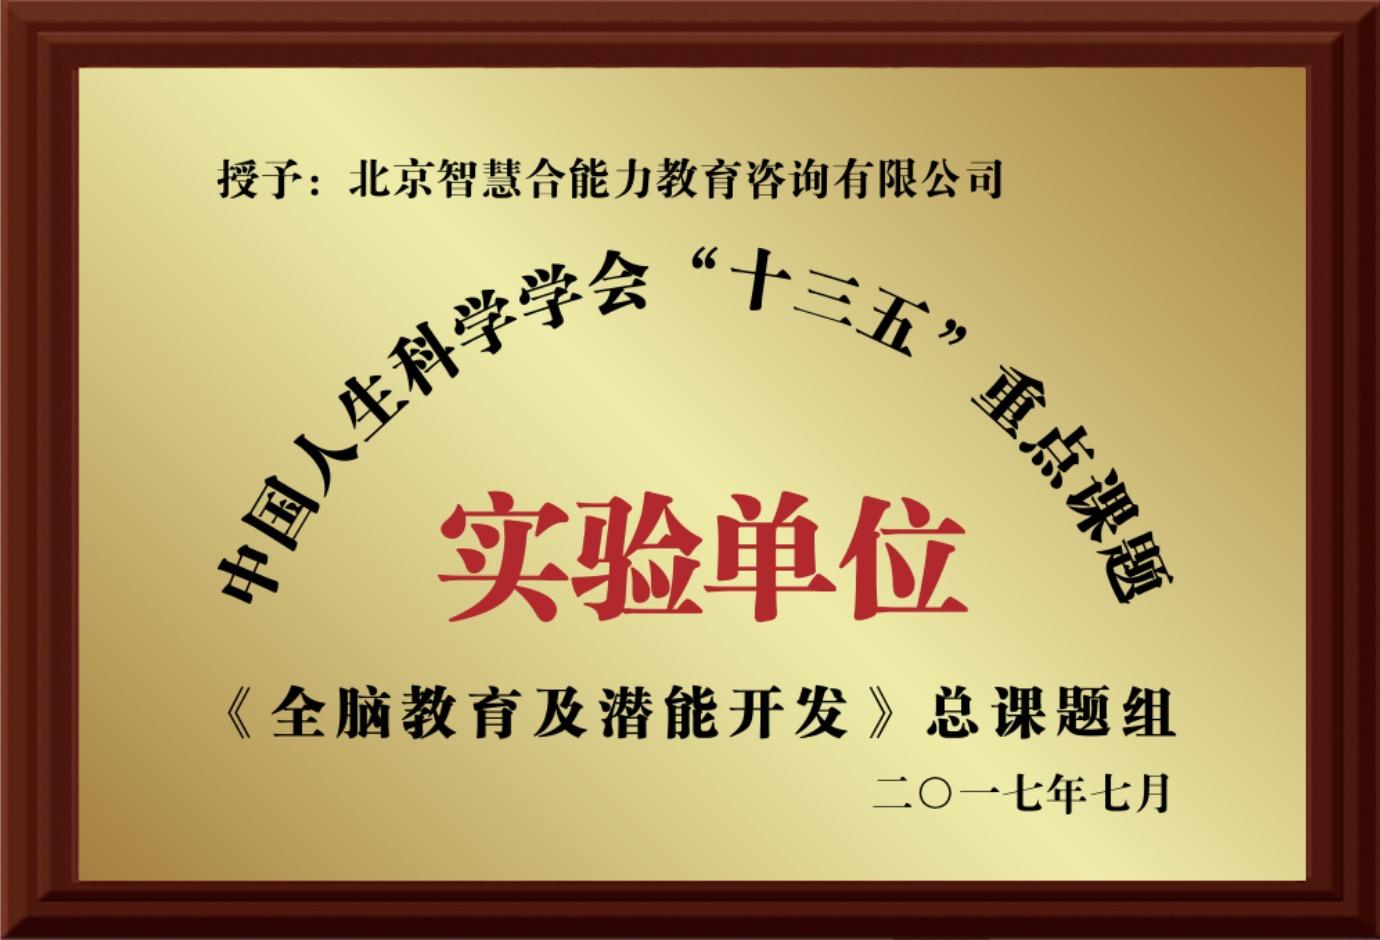 "<span style=""font-size:14px;color:#FFFFFF;"">《全脑教育及潜能开发》总课题组授予北京智慧合能力教育咨询有限公司中国人生科学学会""十三五""重点课题实验单位</span>"